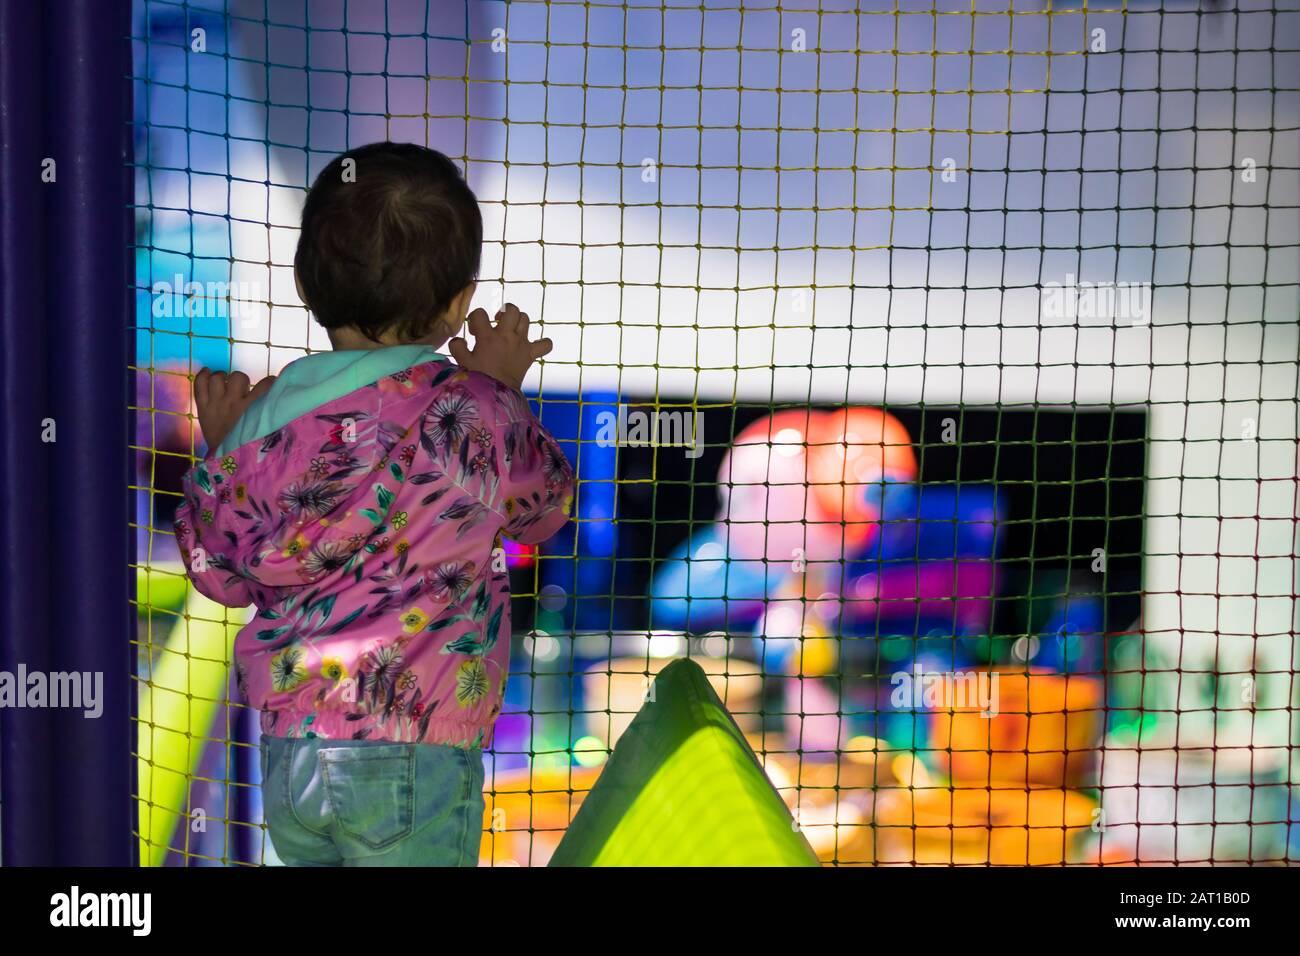 Una linda niña en un parque infantil cubierto en un centro comercial en Dubai, Emiratos Árabes Unidos. Foto de stock